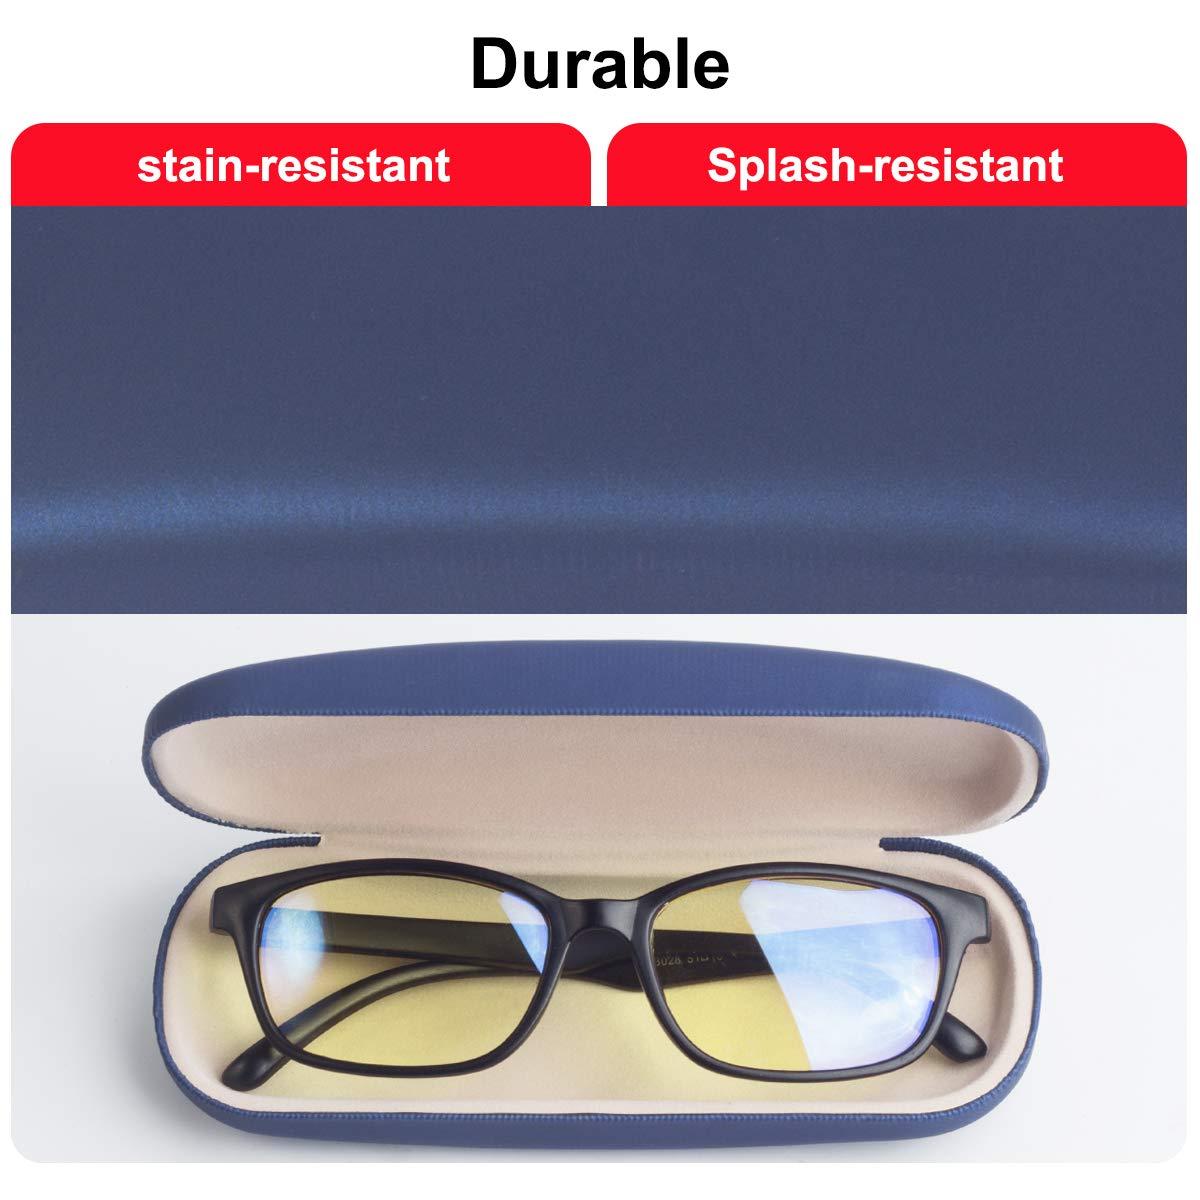 Raylove Unisex Hard Shell Eyeglasses Cases Protective Case For Glasses